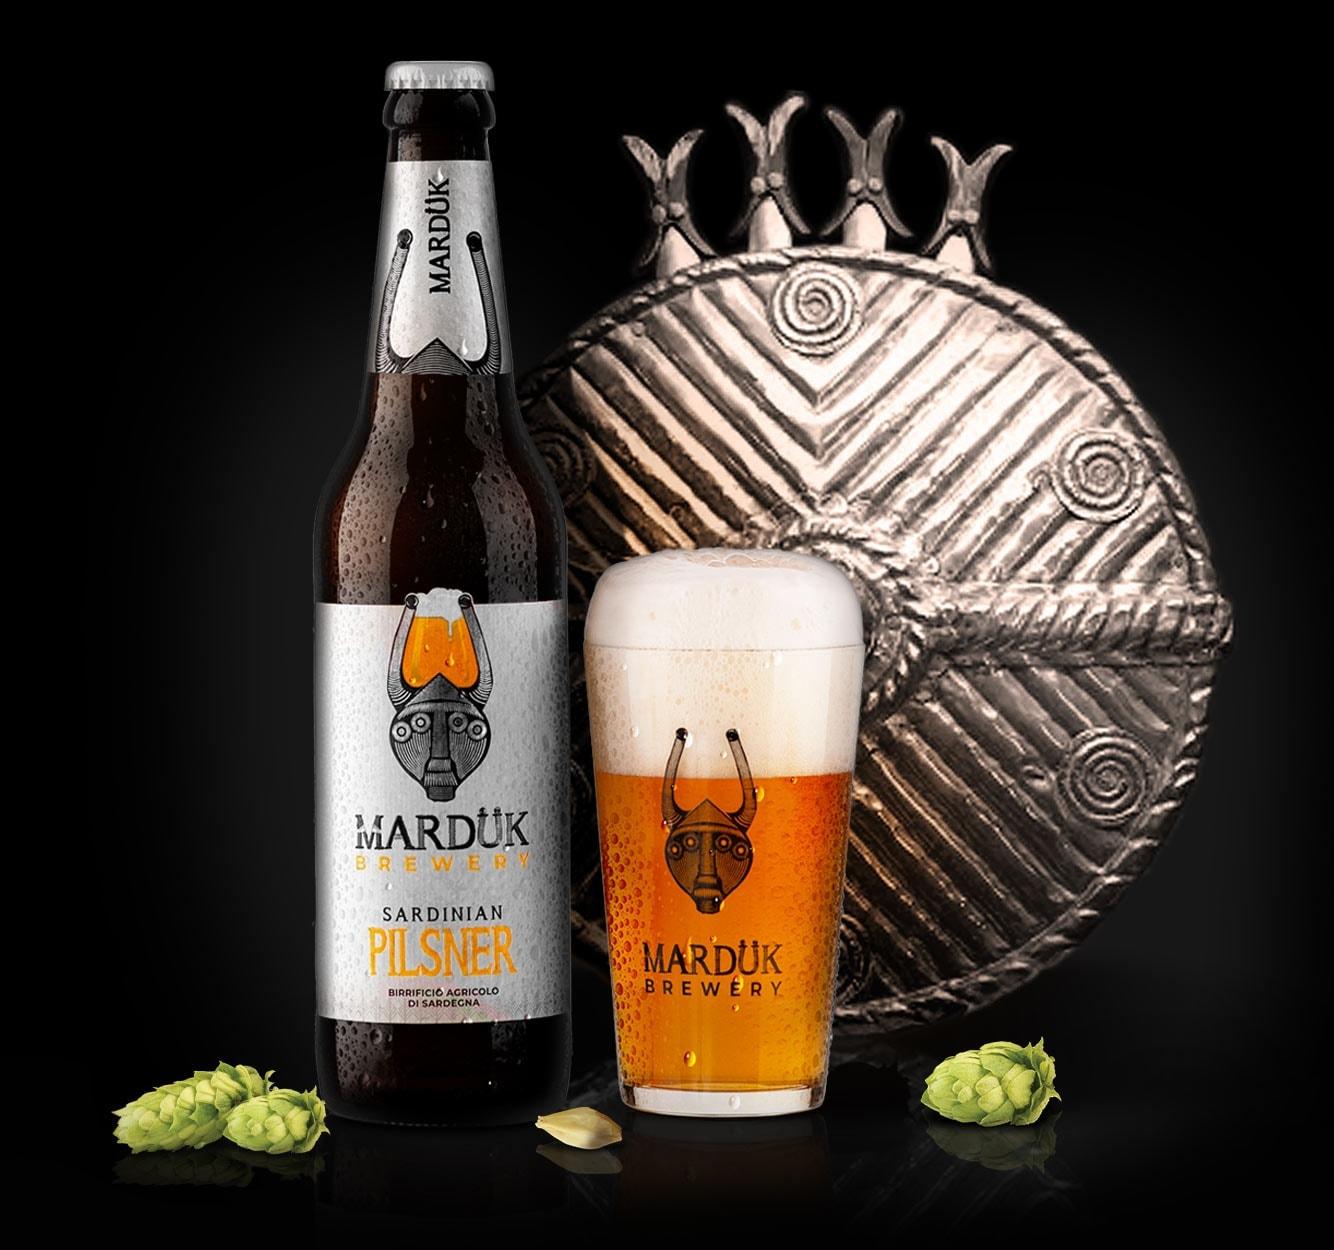 https://www.birrificiomarduk.com/wp-content/uploads/2020/06/04e02-linea-giornaliere-Pilsner-sardinian-guerrieri-Marduk-brewery-birre-birrificio-materie-prime-lupolo-malto-orzo.jpg